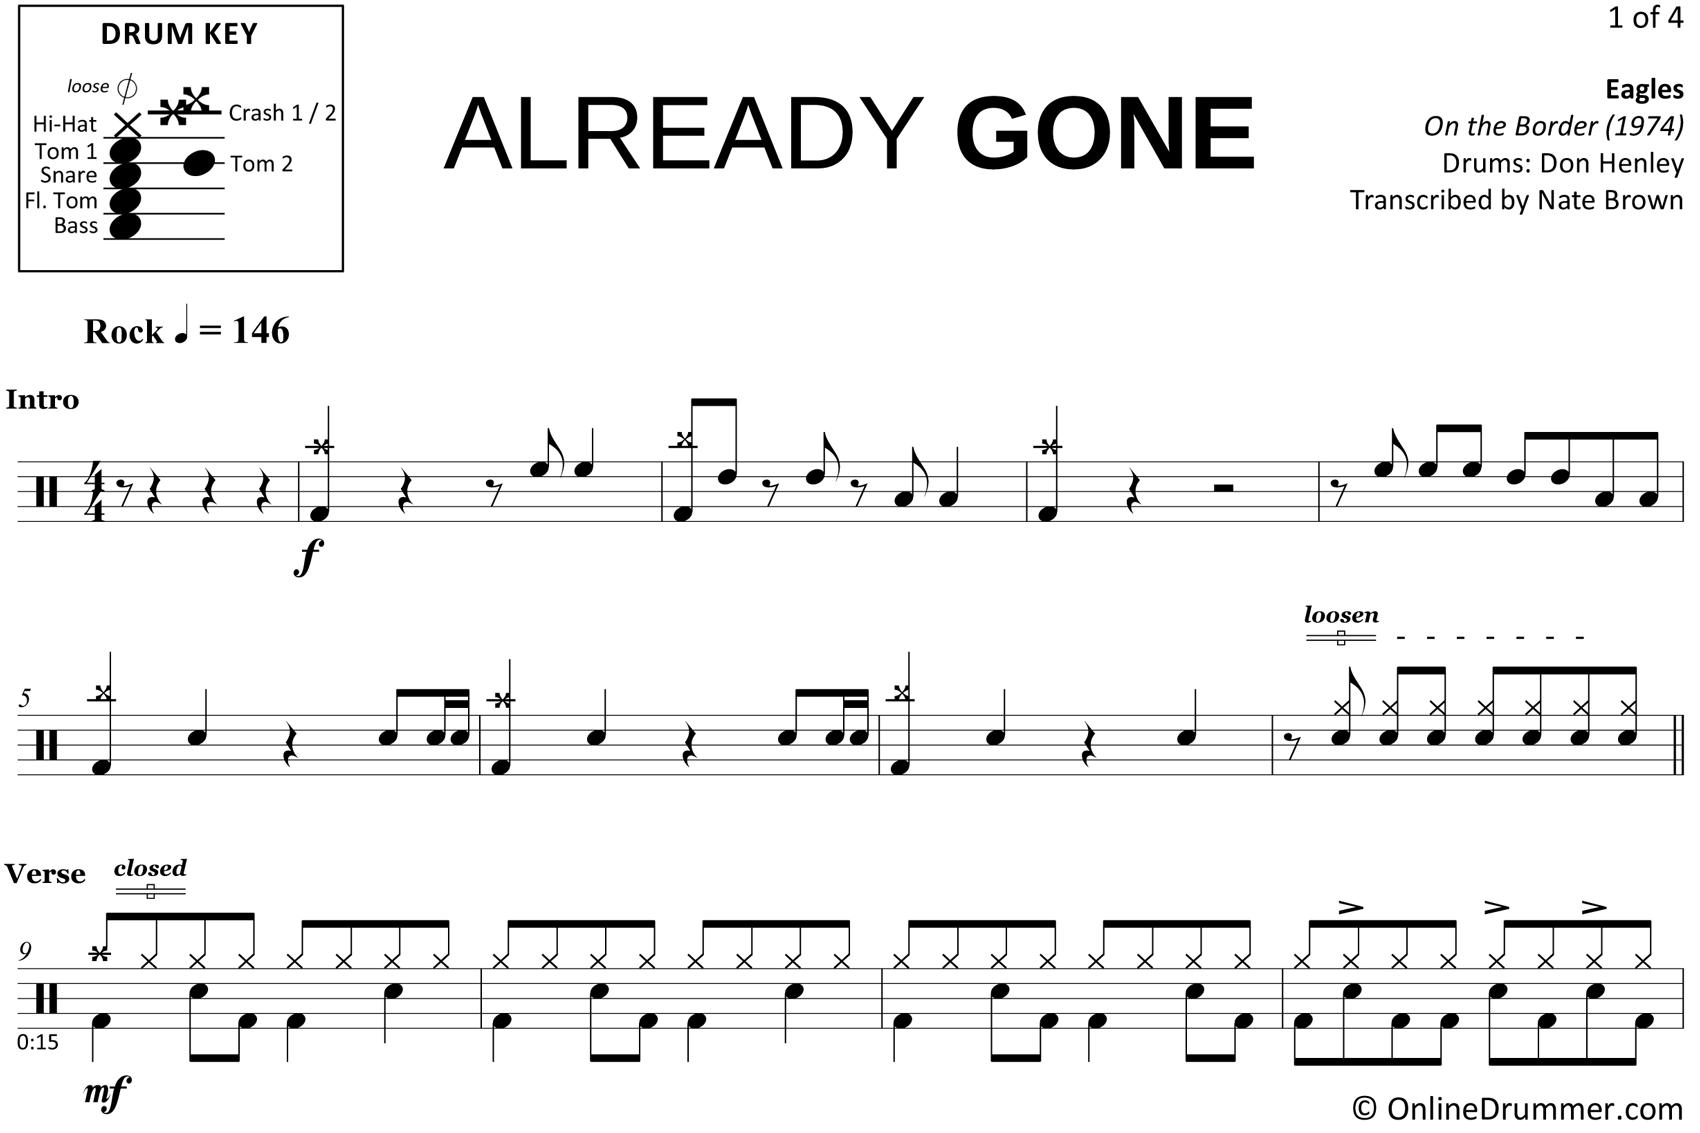 Already Gone - Eagles - Drum Sheet Music